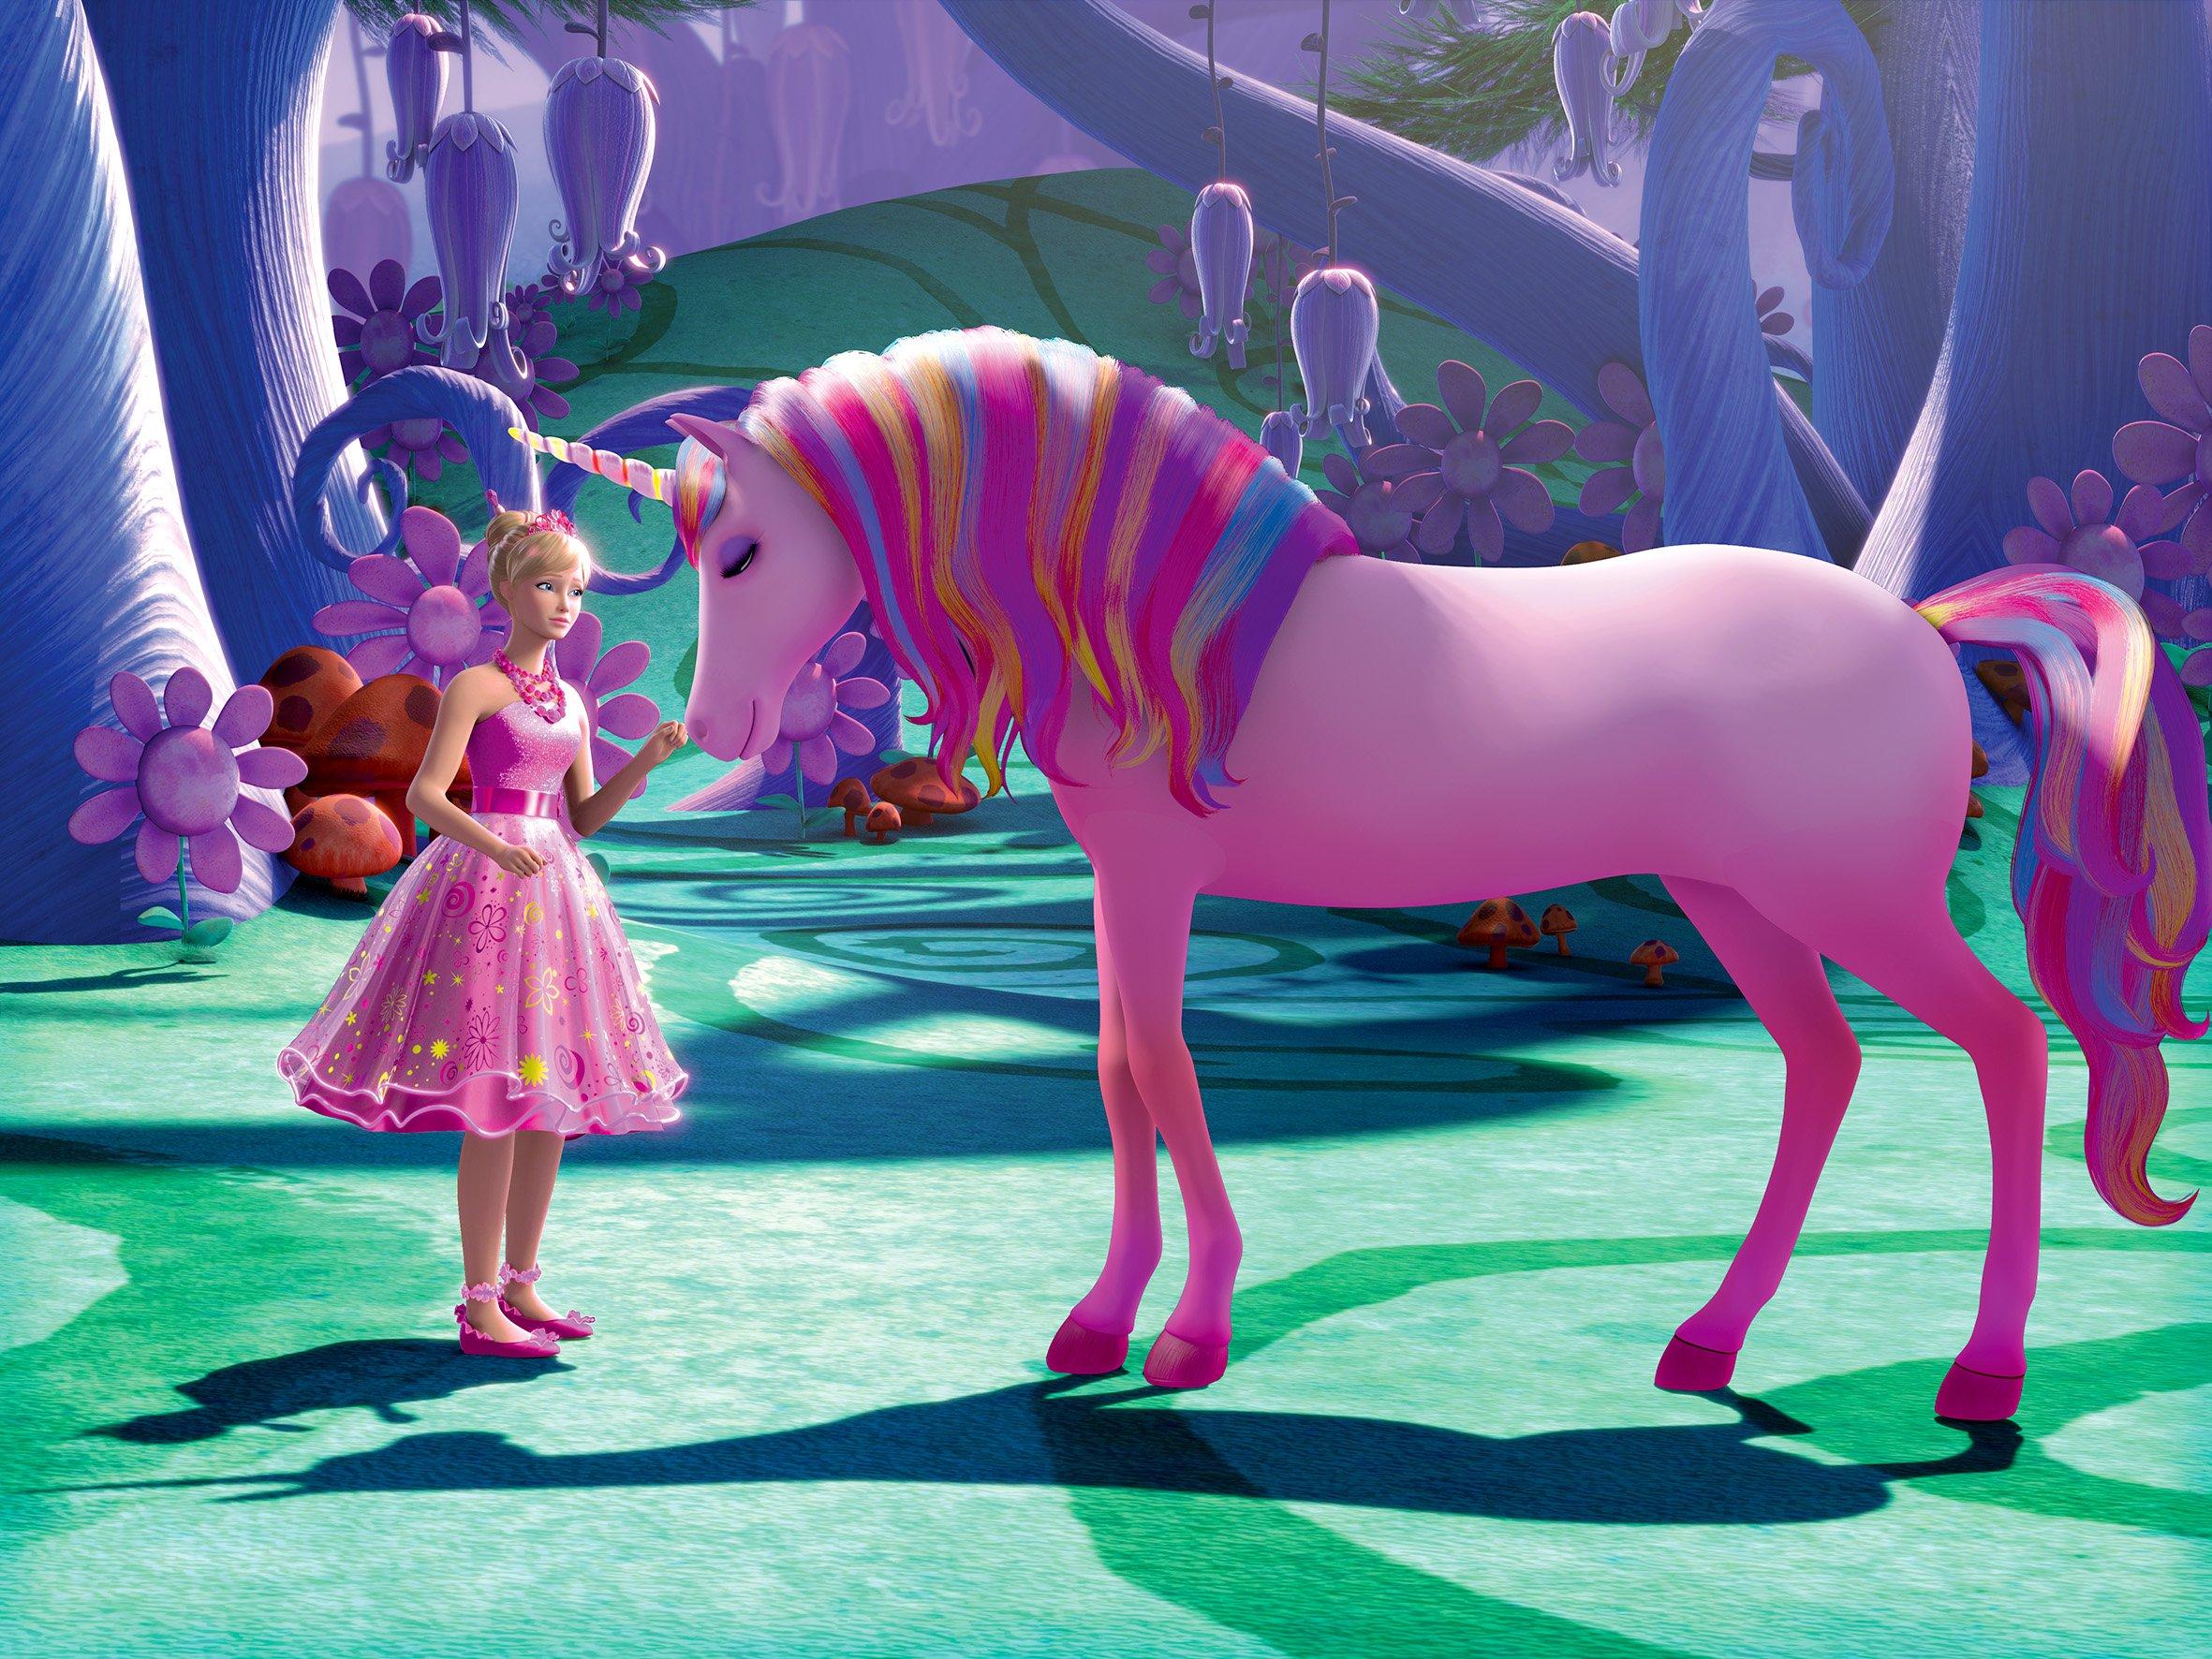 Barbie et la porte secr te barbie and the secret door - Barbie et la porte secrete film complet ...